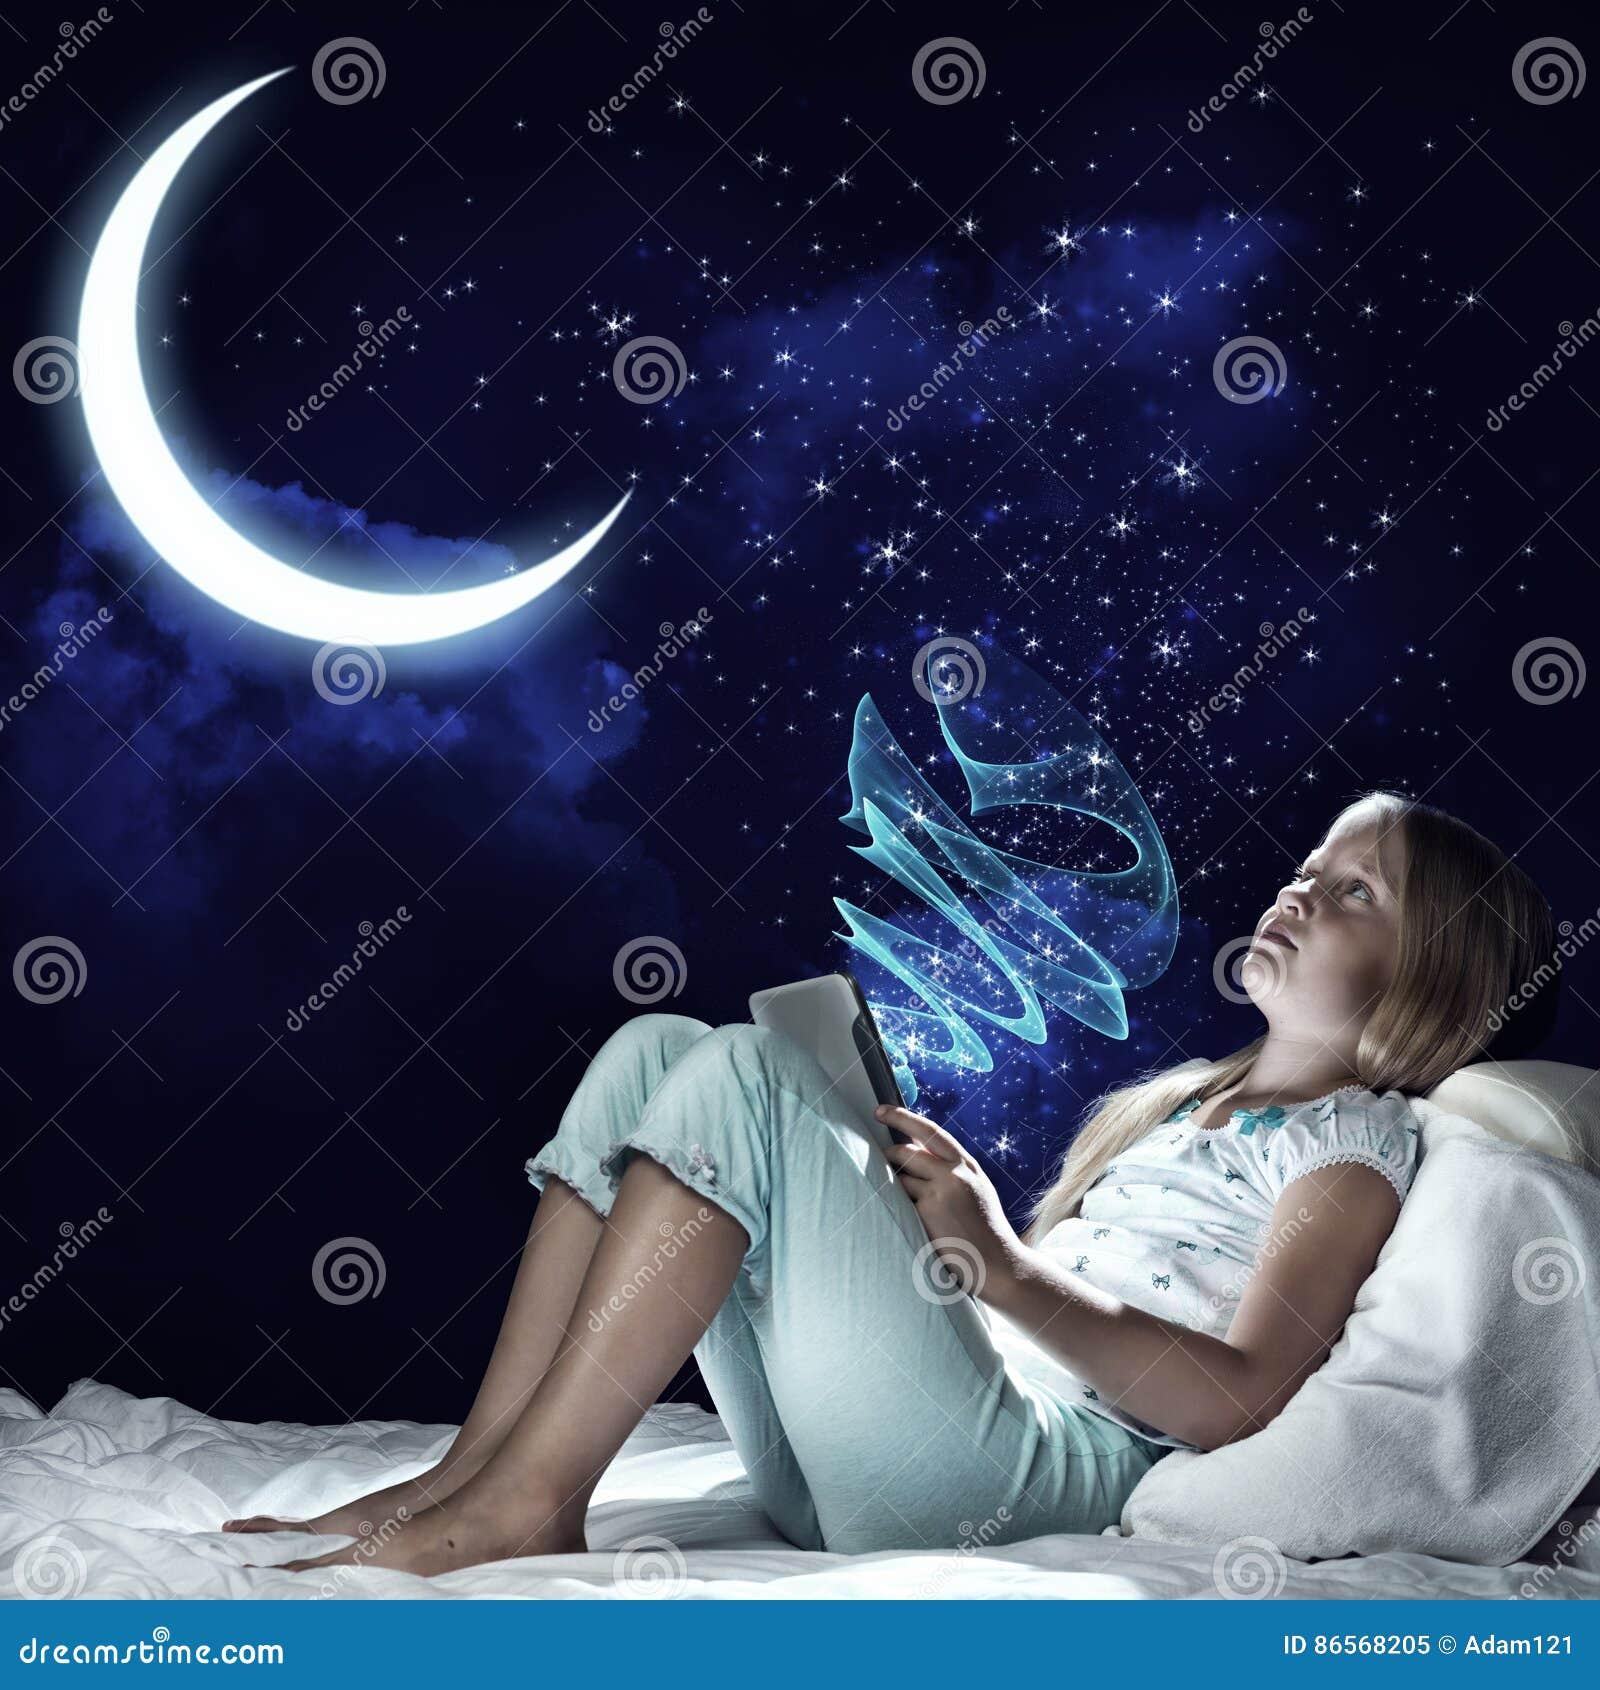 Kids at night with moon royalty free stock photography image - Royalty Free Stock Photo Kid Girl Before Sleep Stock Photo